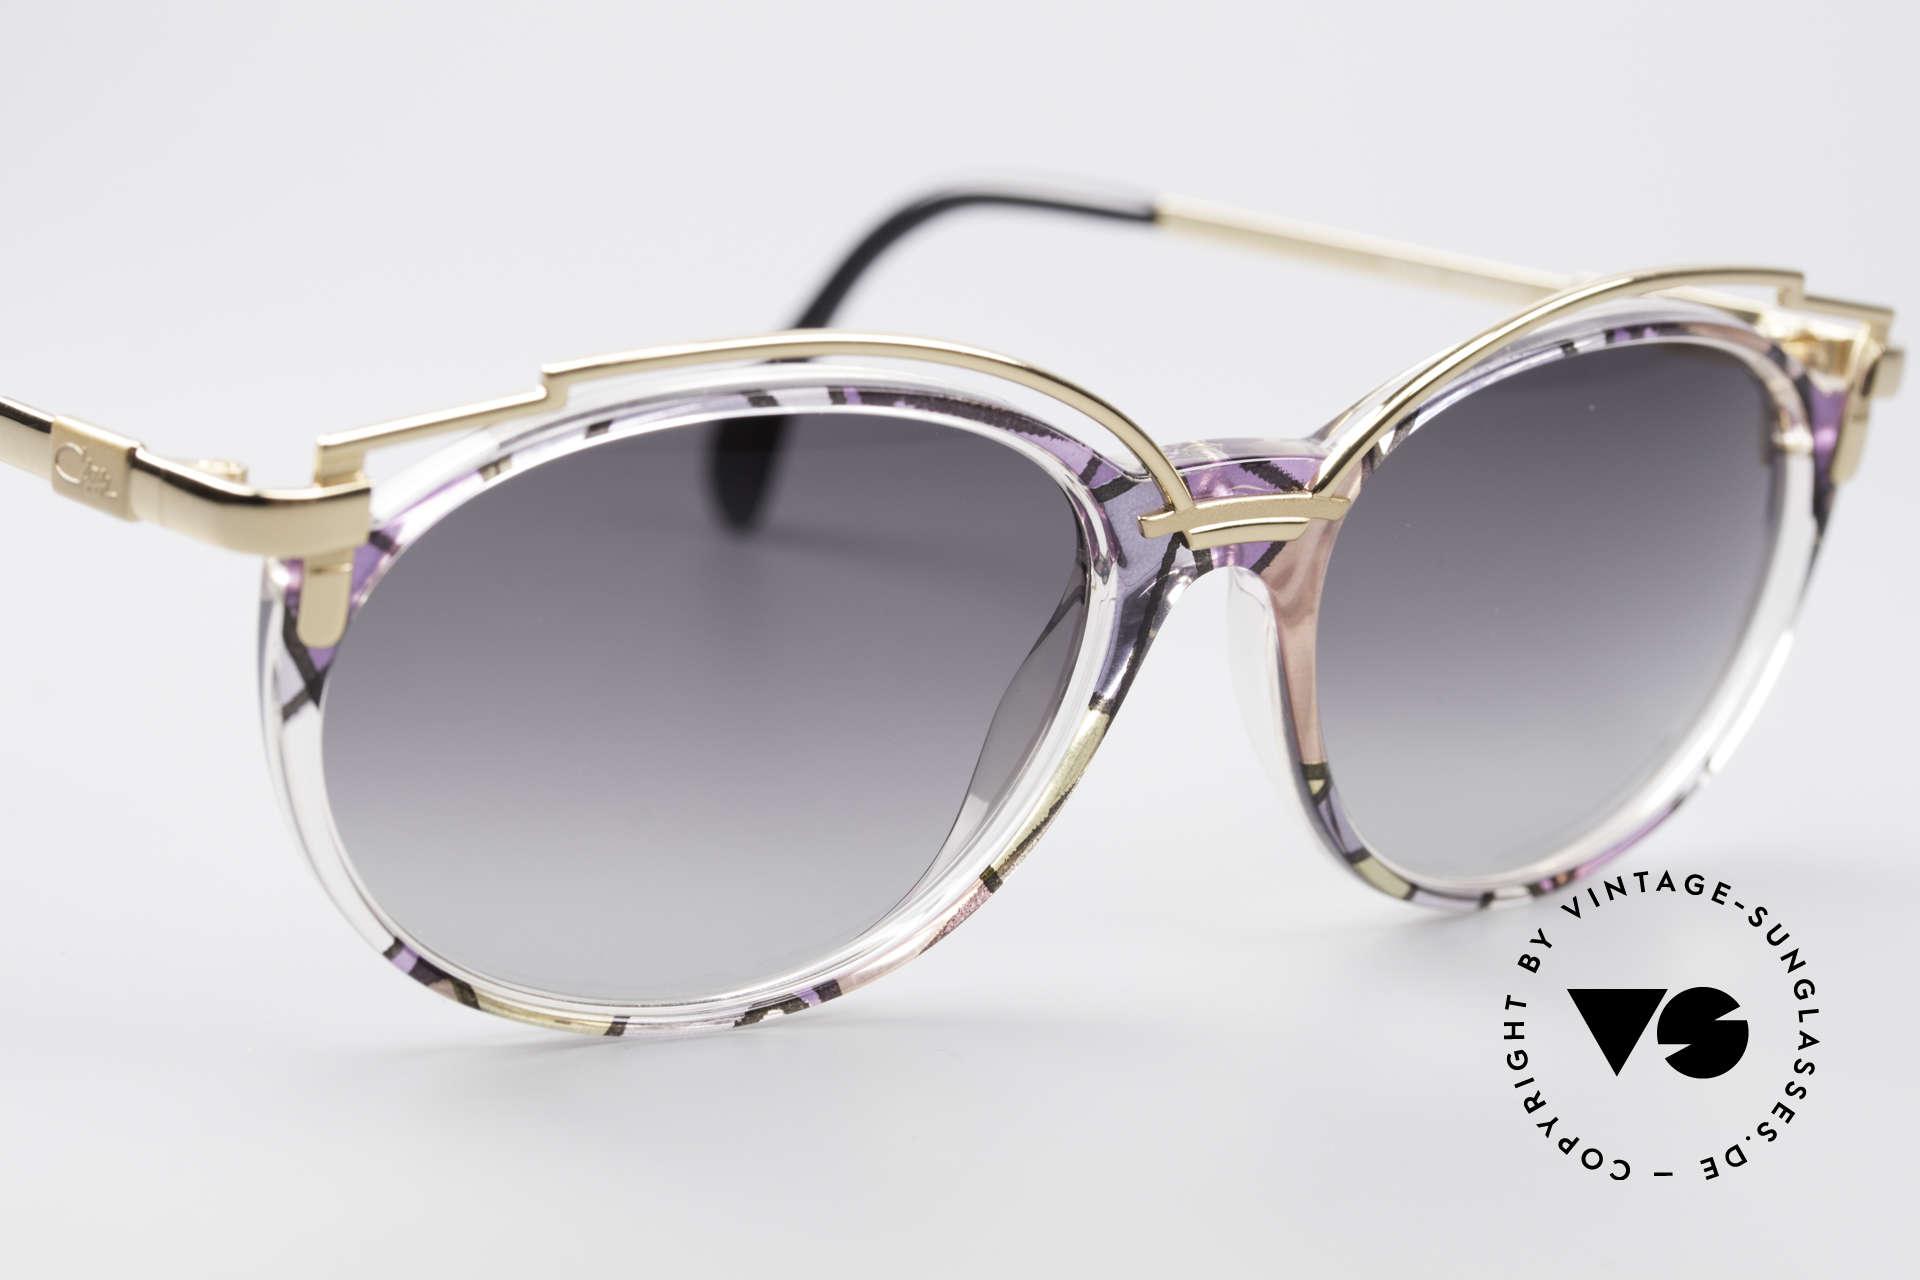 Cazal 358 Vintage 90's Creation Cazal, unworn, NOS (like all our rare vintage Cazal eyewear), Made for Women